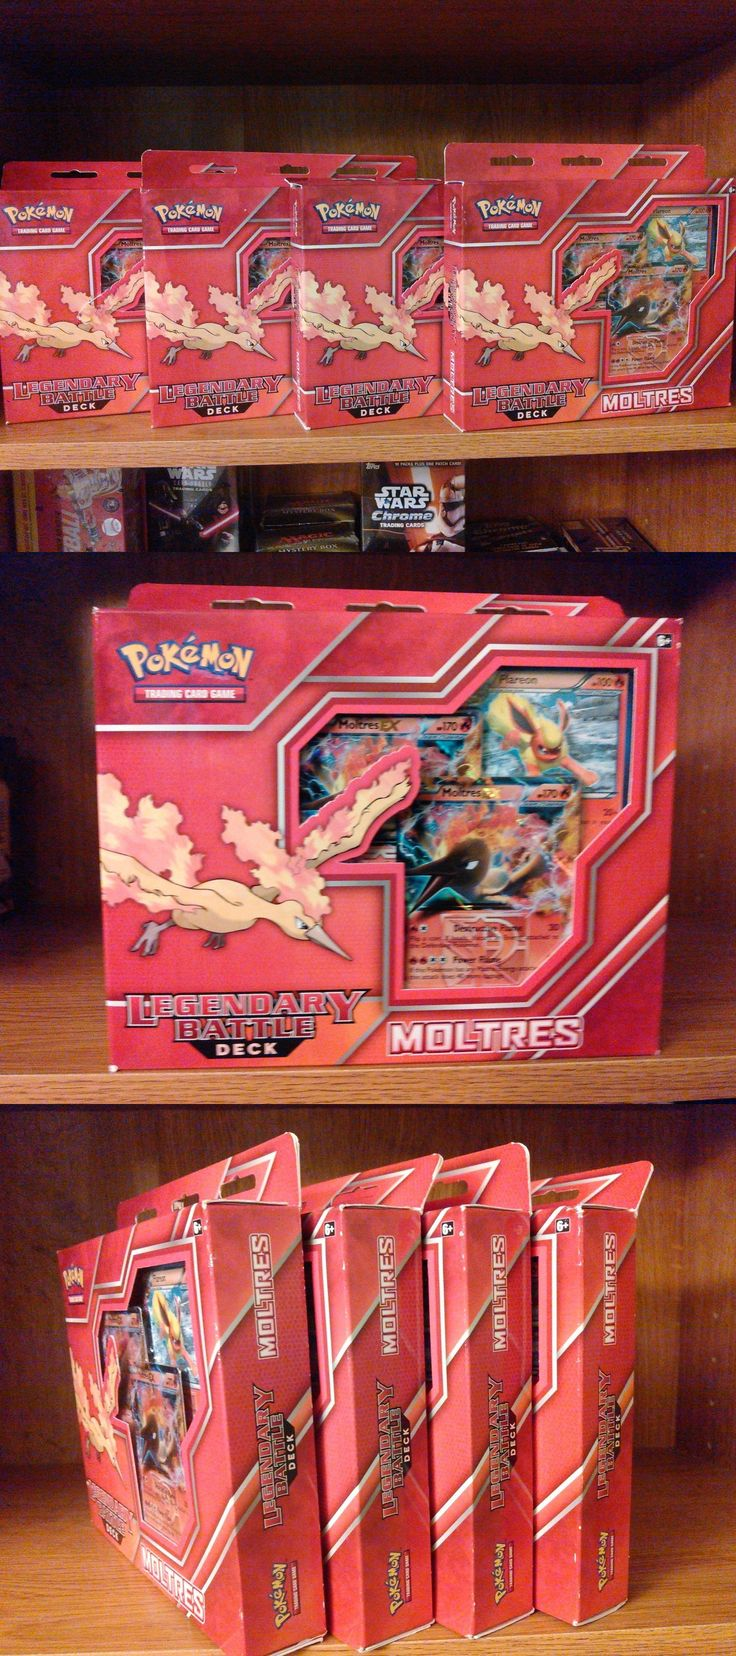 25 best ideas about pokemon moltres on pinterest real pokemon games - Pok Mon Sealed Decks And Kits 183467 Lot Of 4 Pokemon Legendary Battle